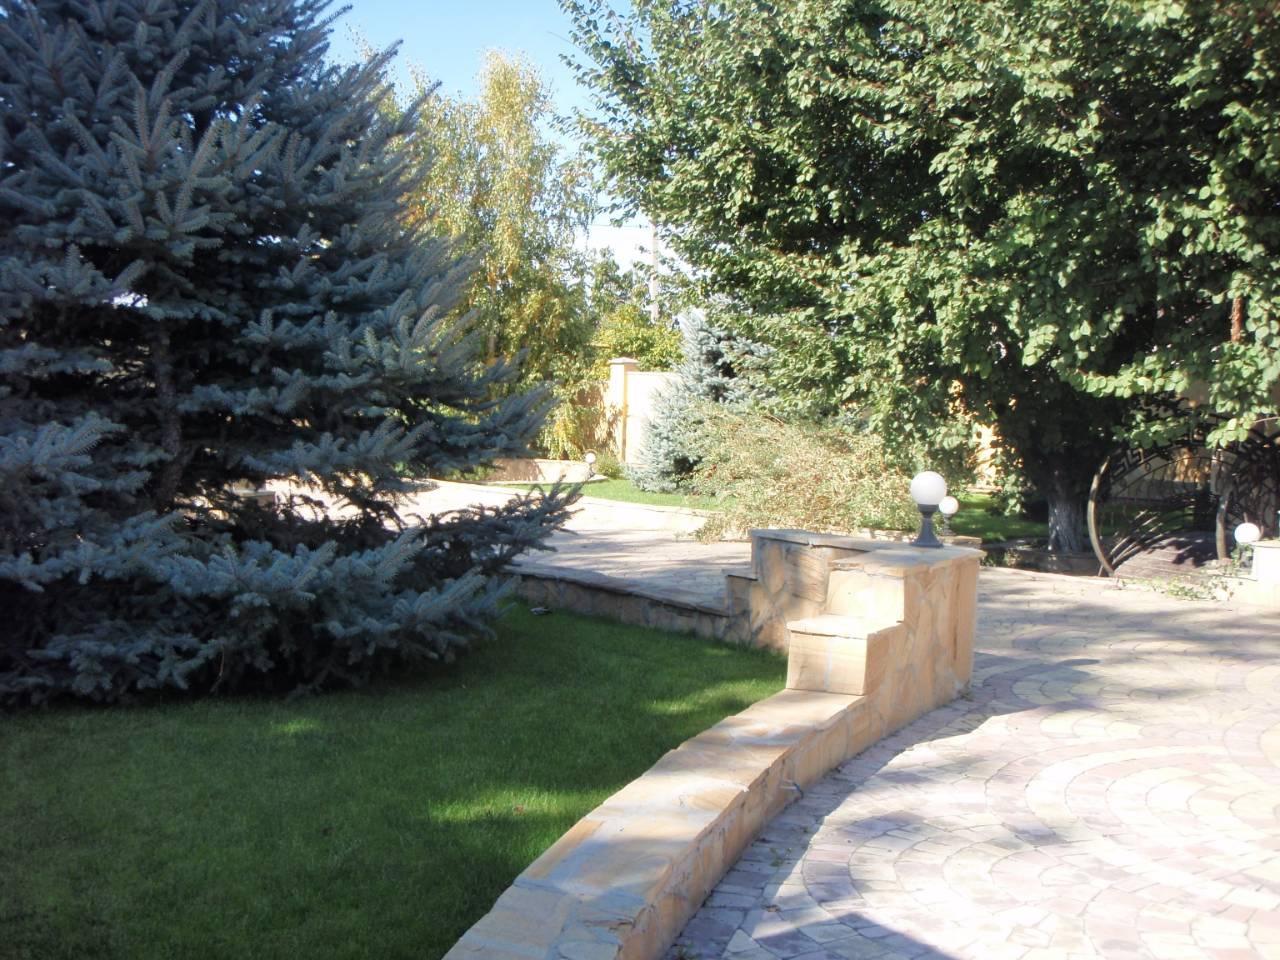 Продается Дом на ул. Ивана Липы (Калинина) — 550 000 у.е. (фото №23)